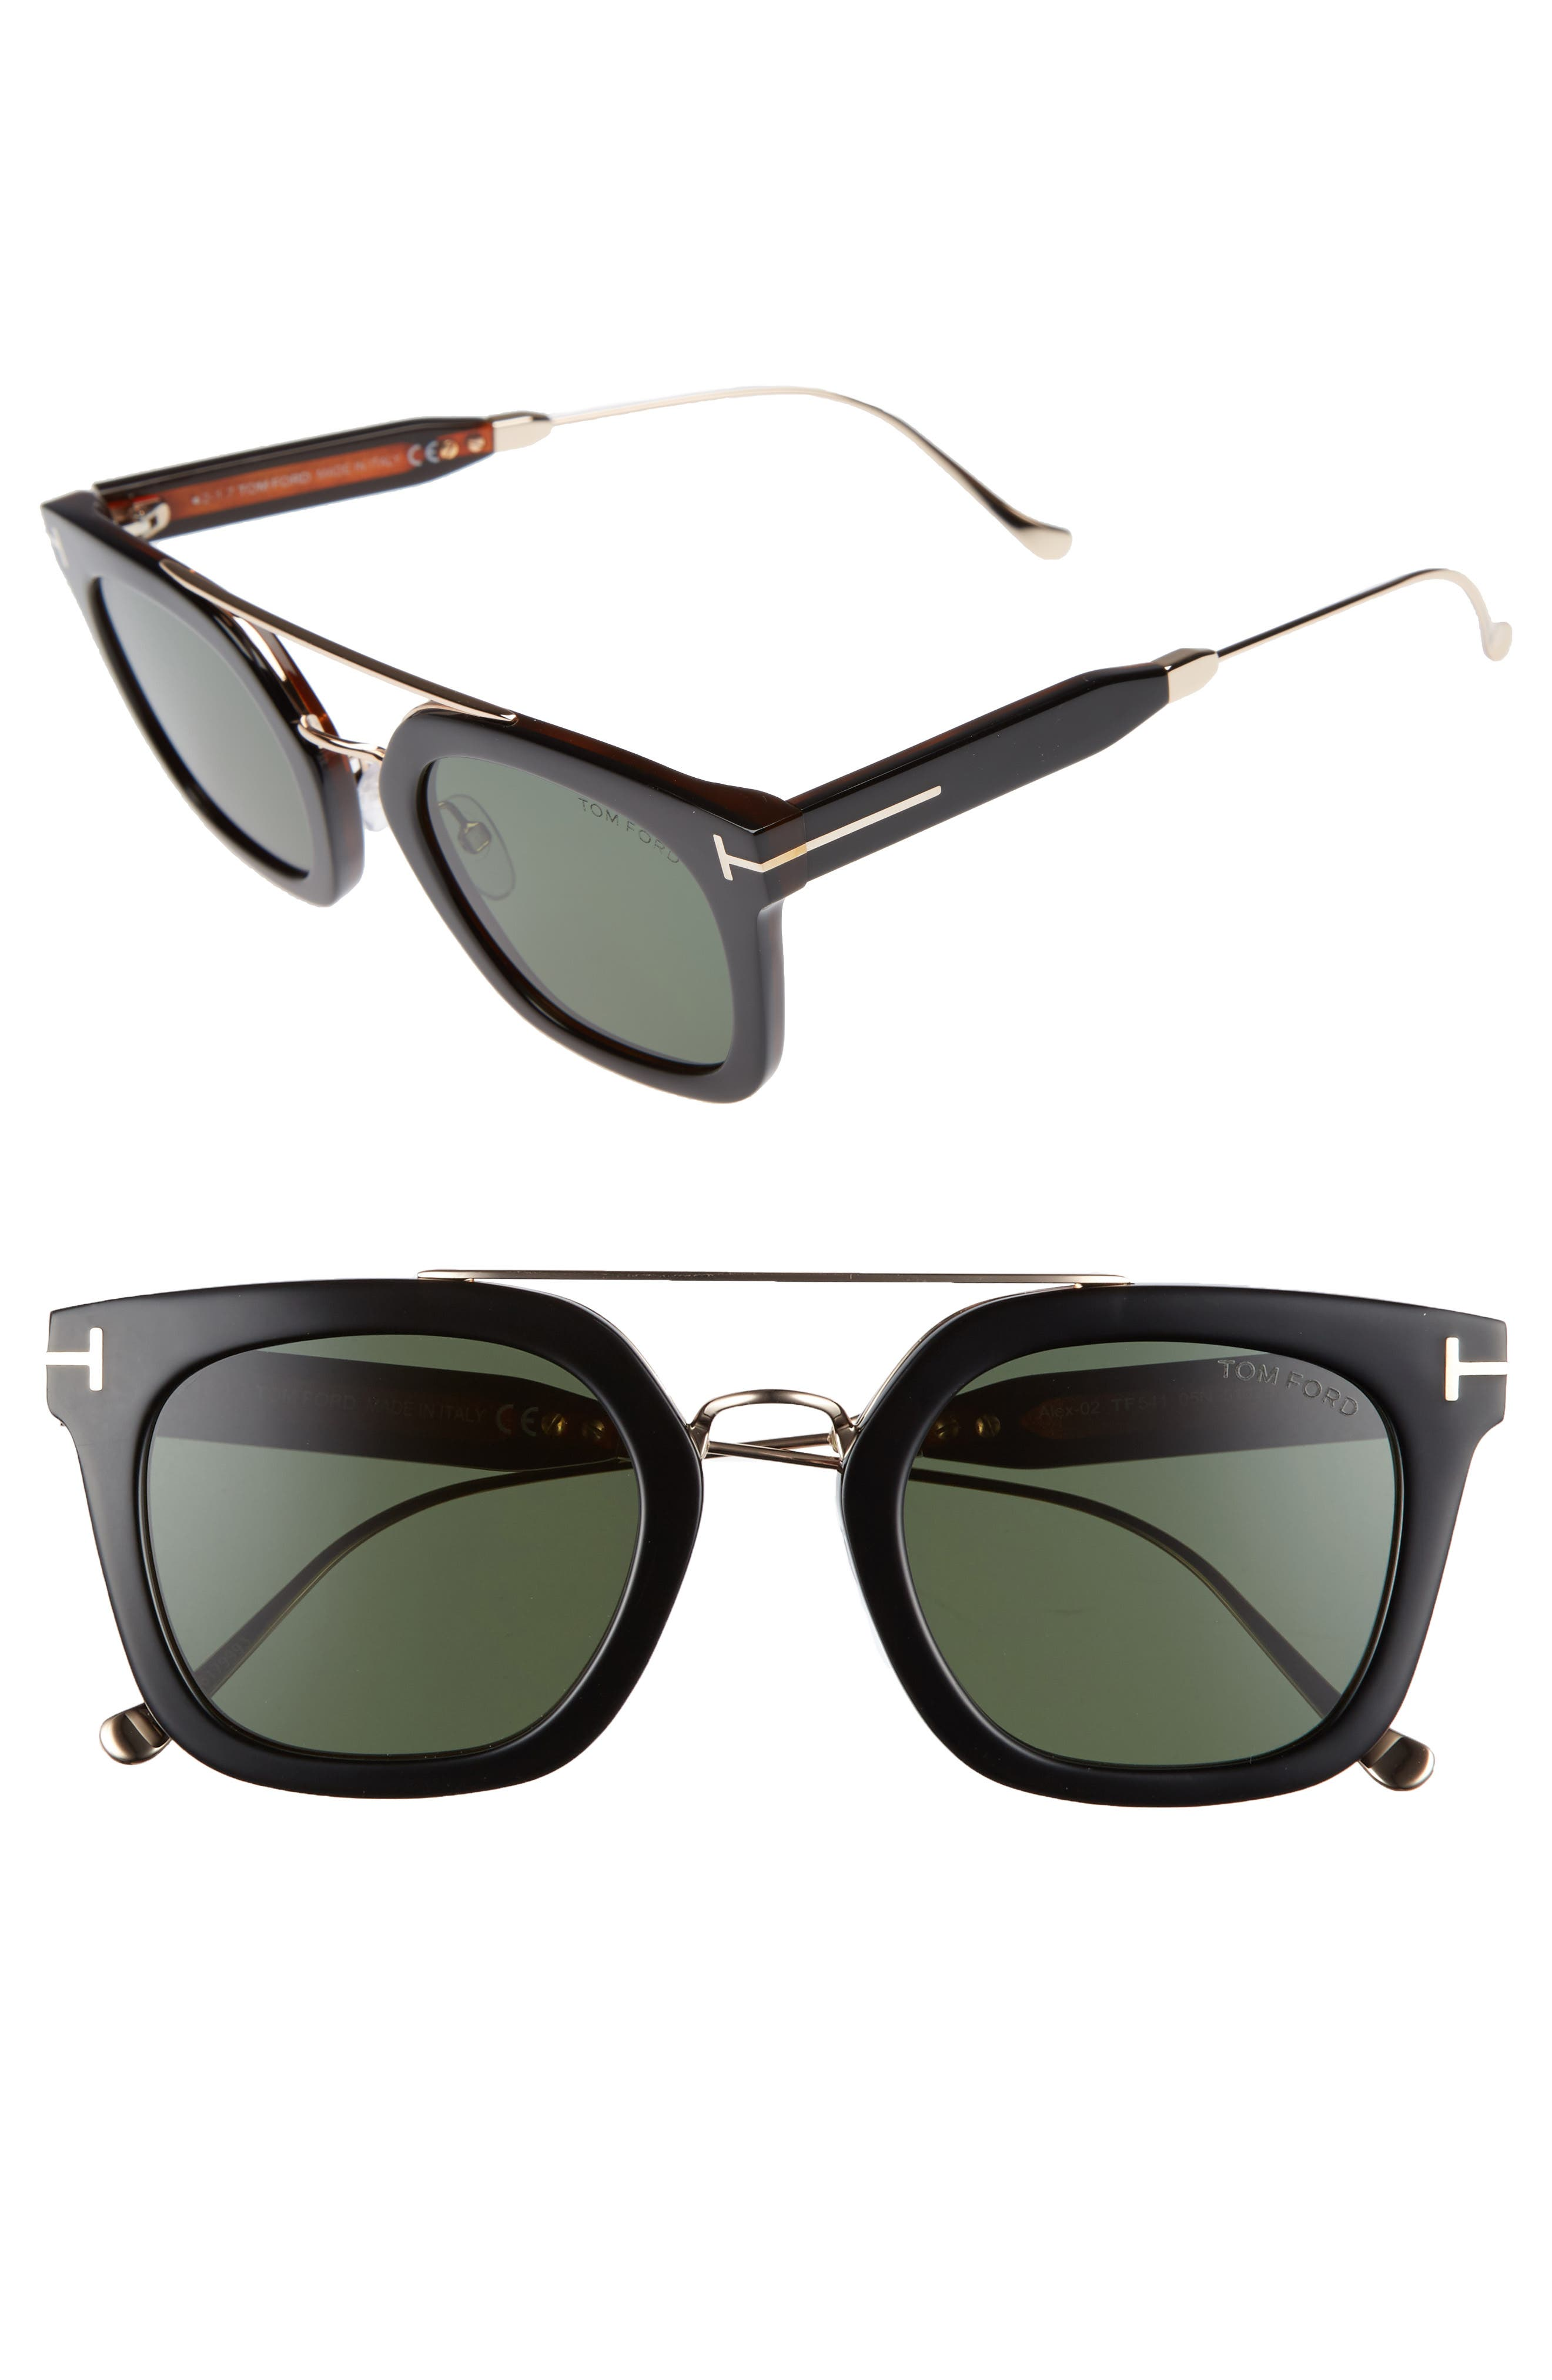 Alex 51mm Sunglasses,                             Main thumbnail 1, color,                             BLACK/ OTHER / GREEN